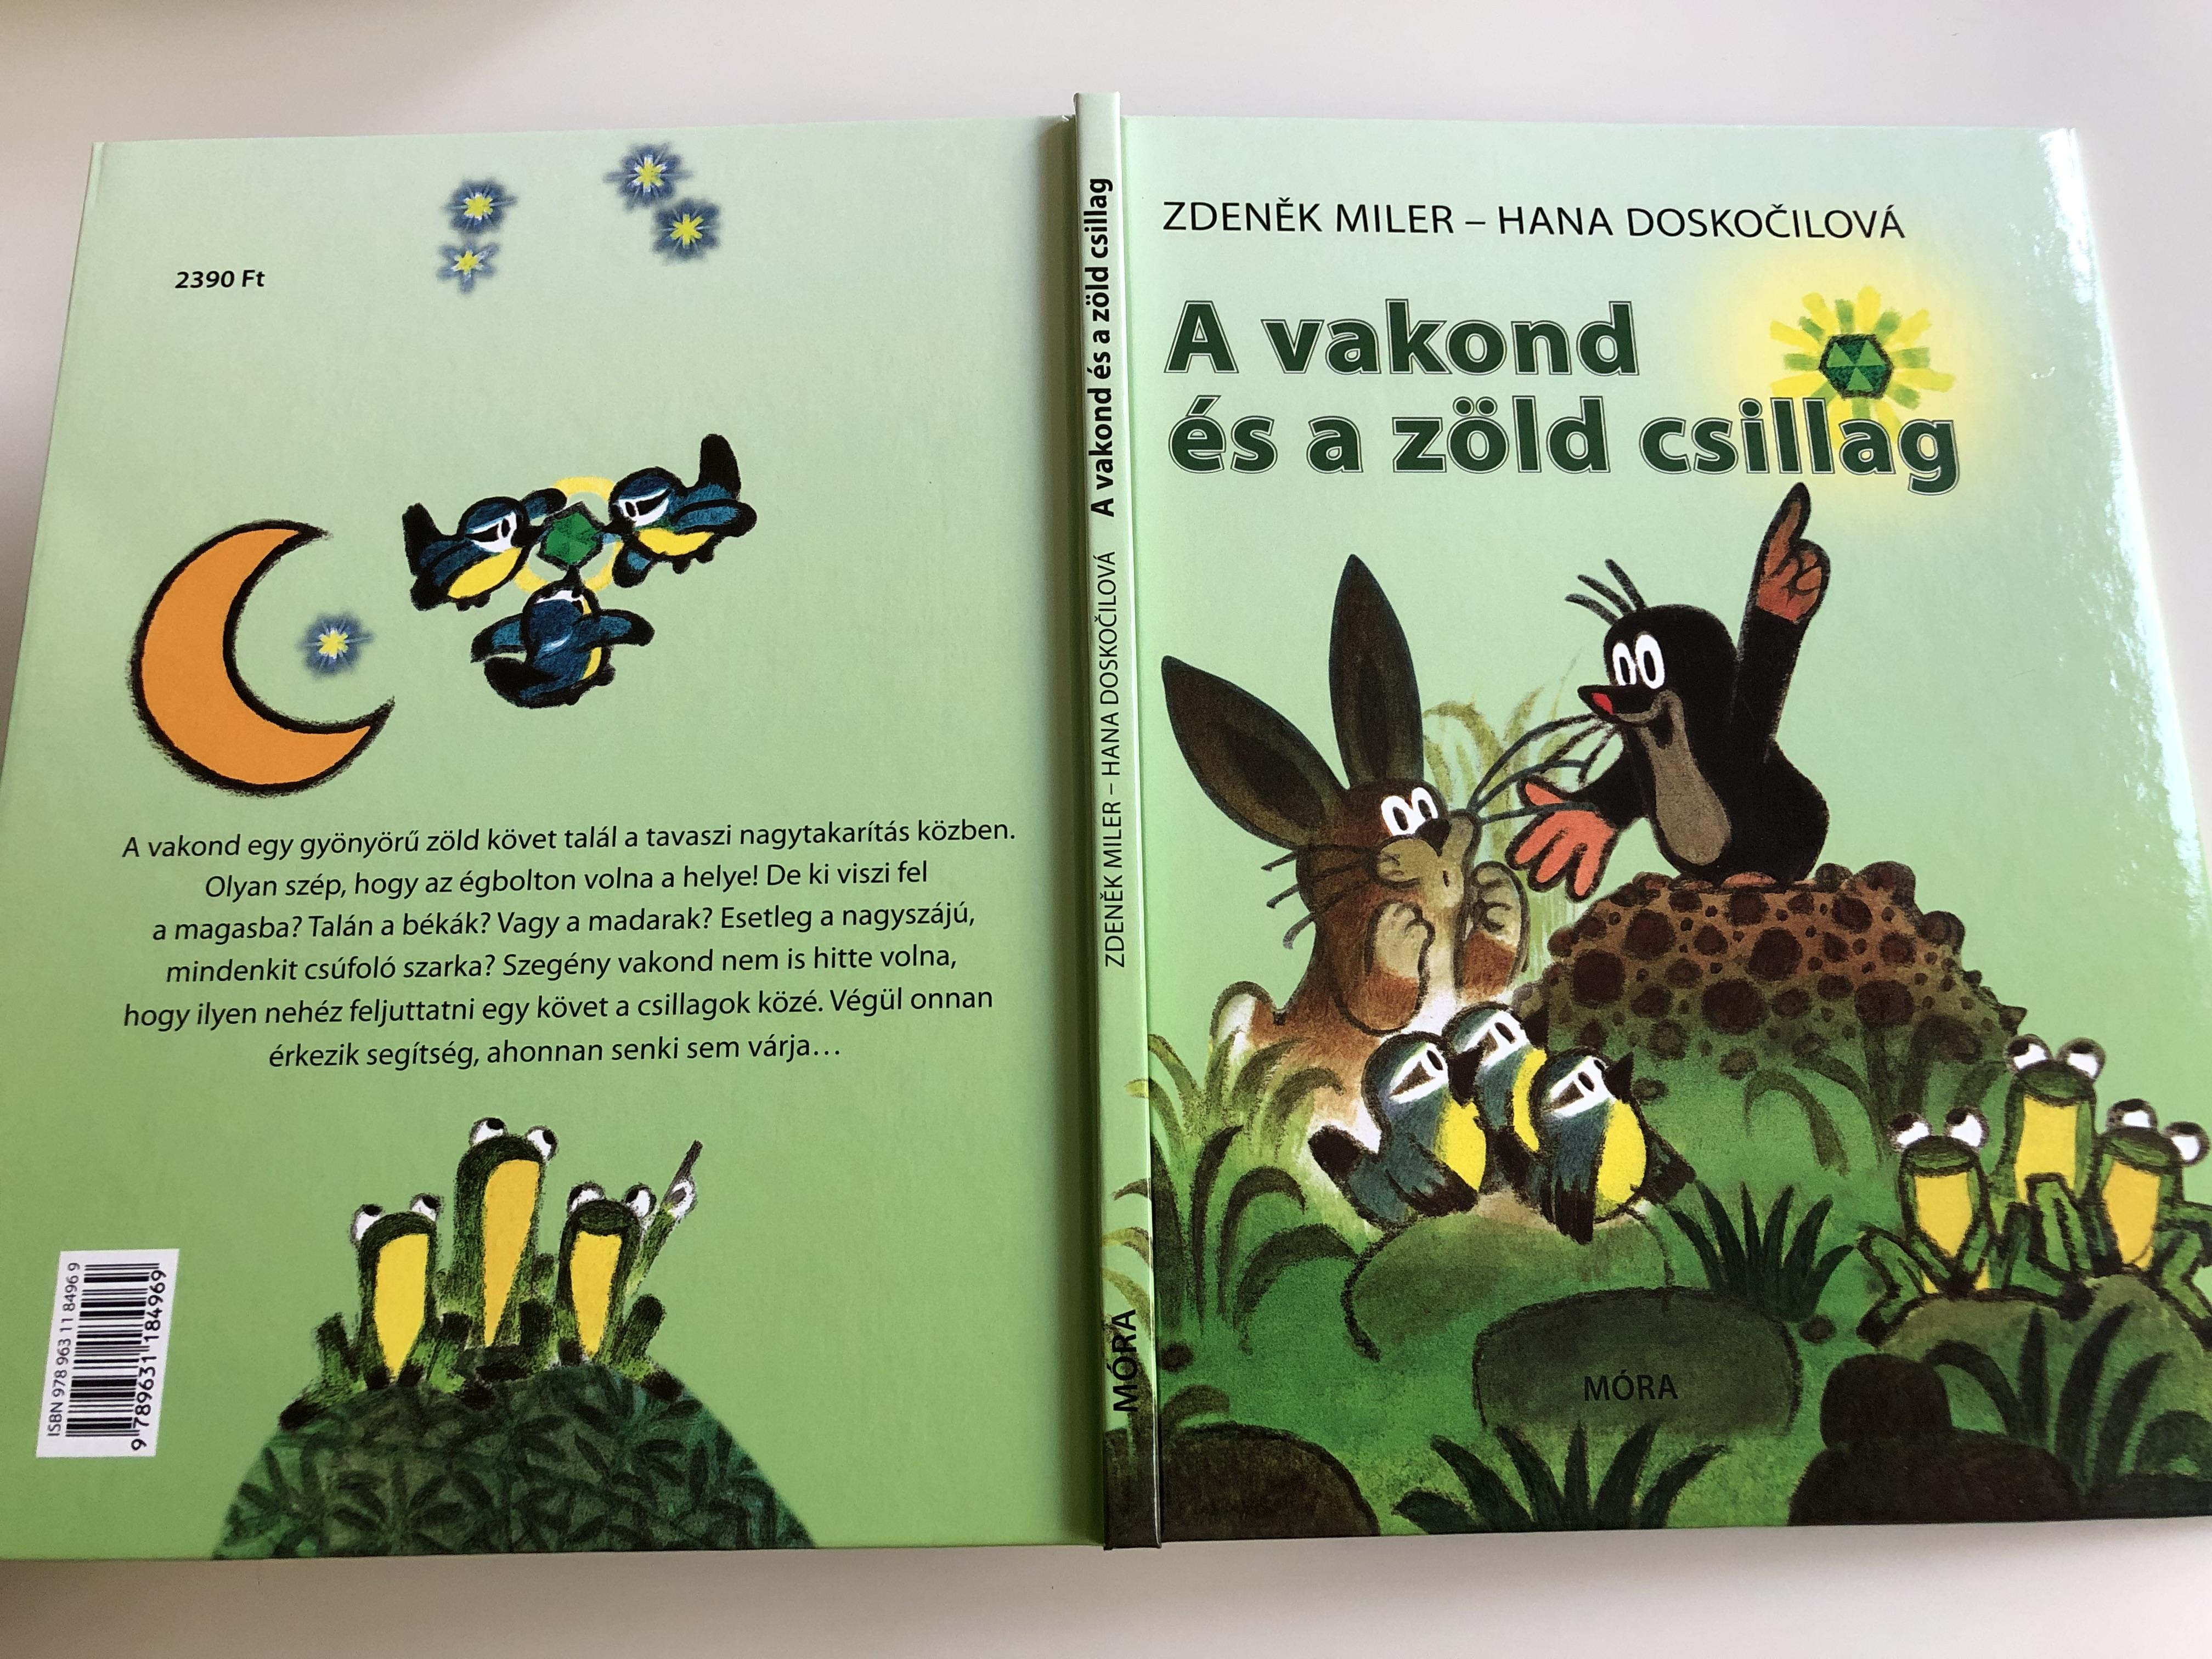 a-vakond-s-a-z-ld-csillag-by-zdenek-miler-hana-dosko-ilov-hungarian-translation-of-krtek-a-zelena-hvezda-m-ra-k-nyvkiad-2008-10-.jpg